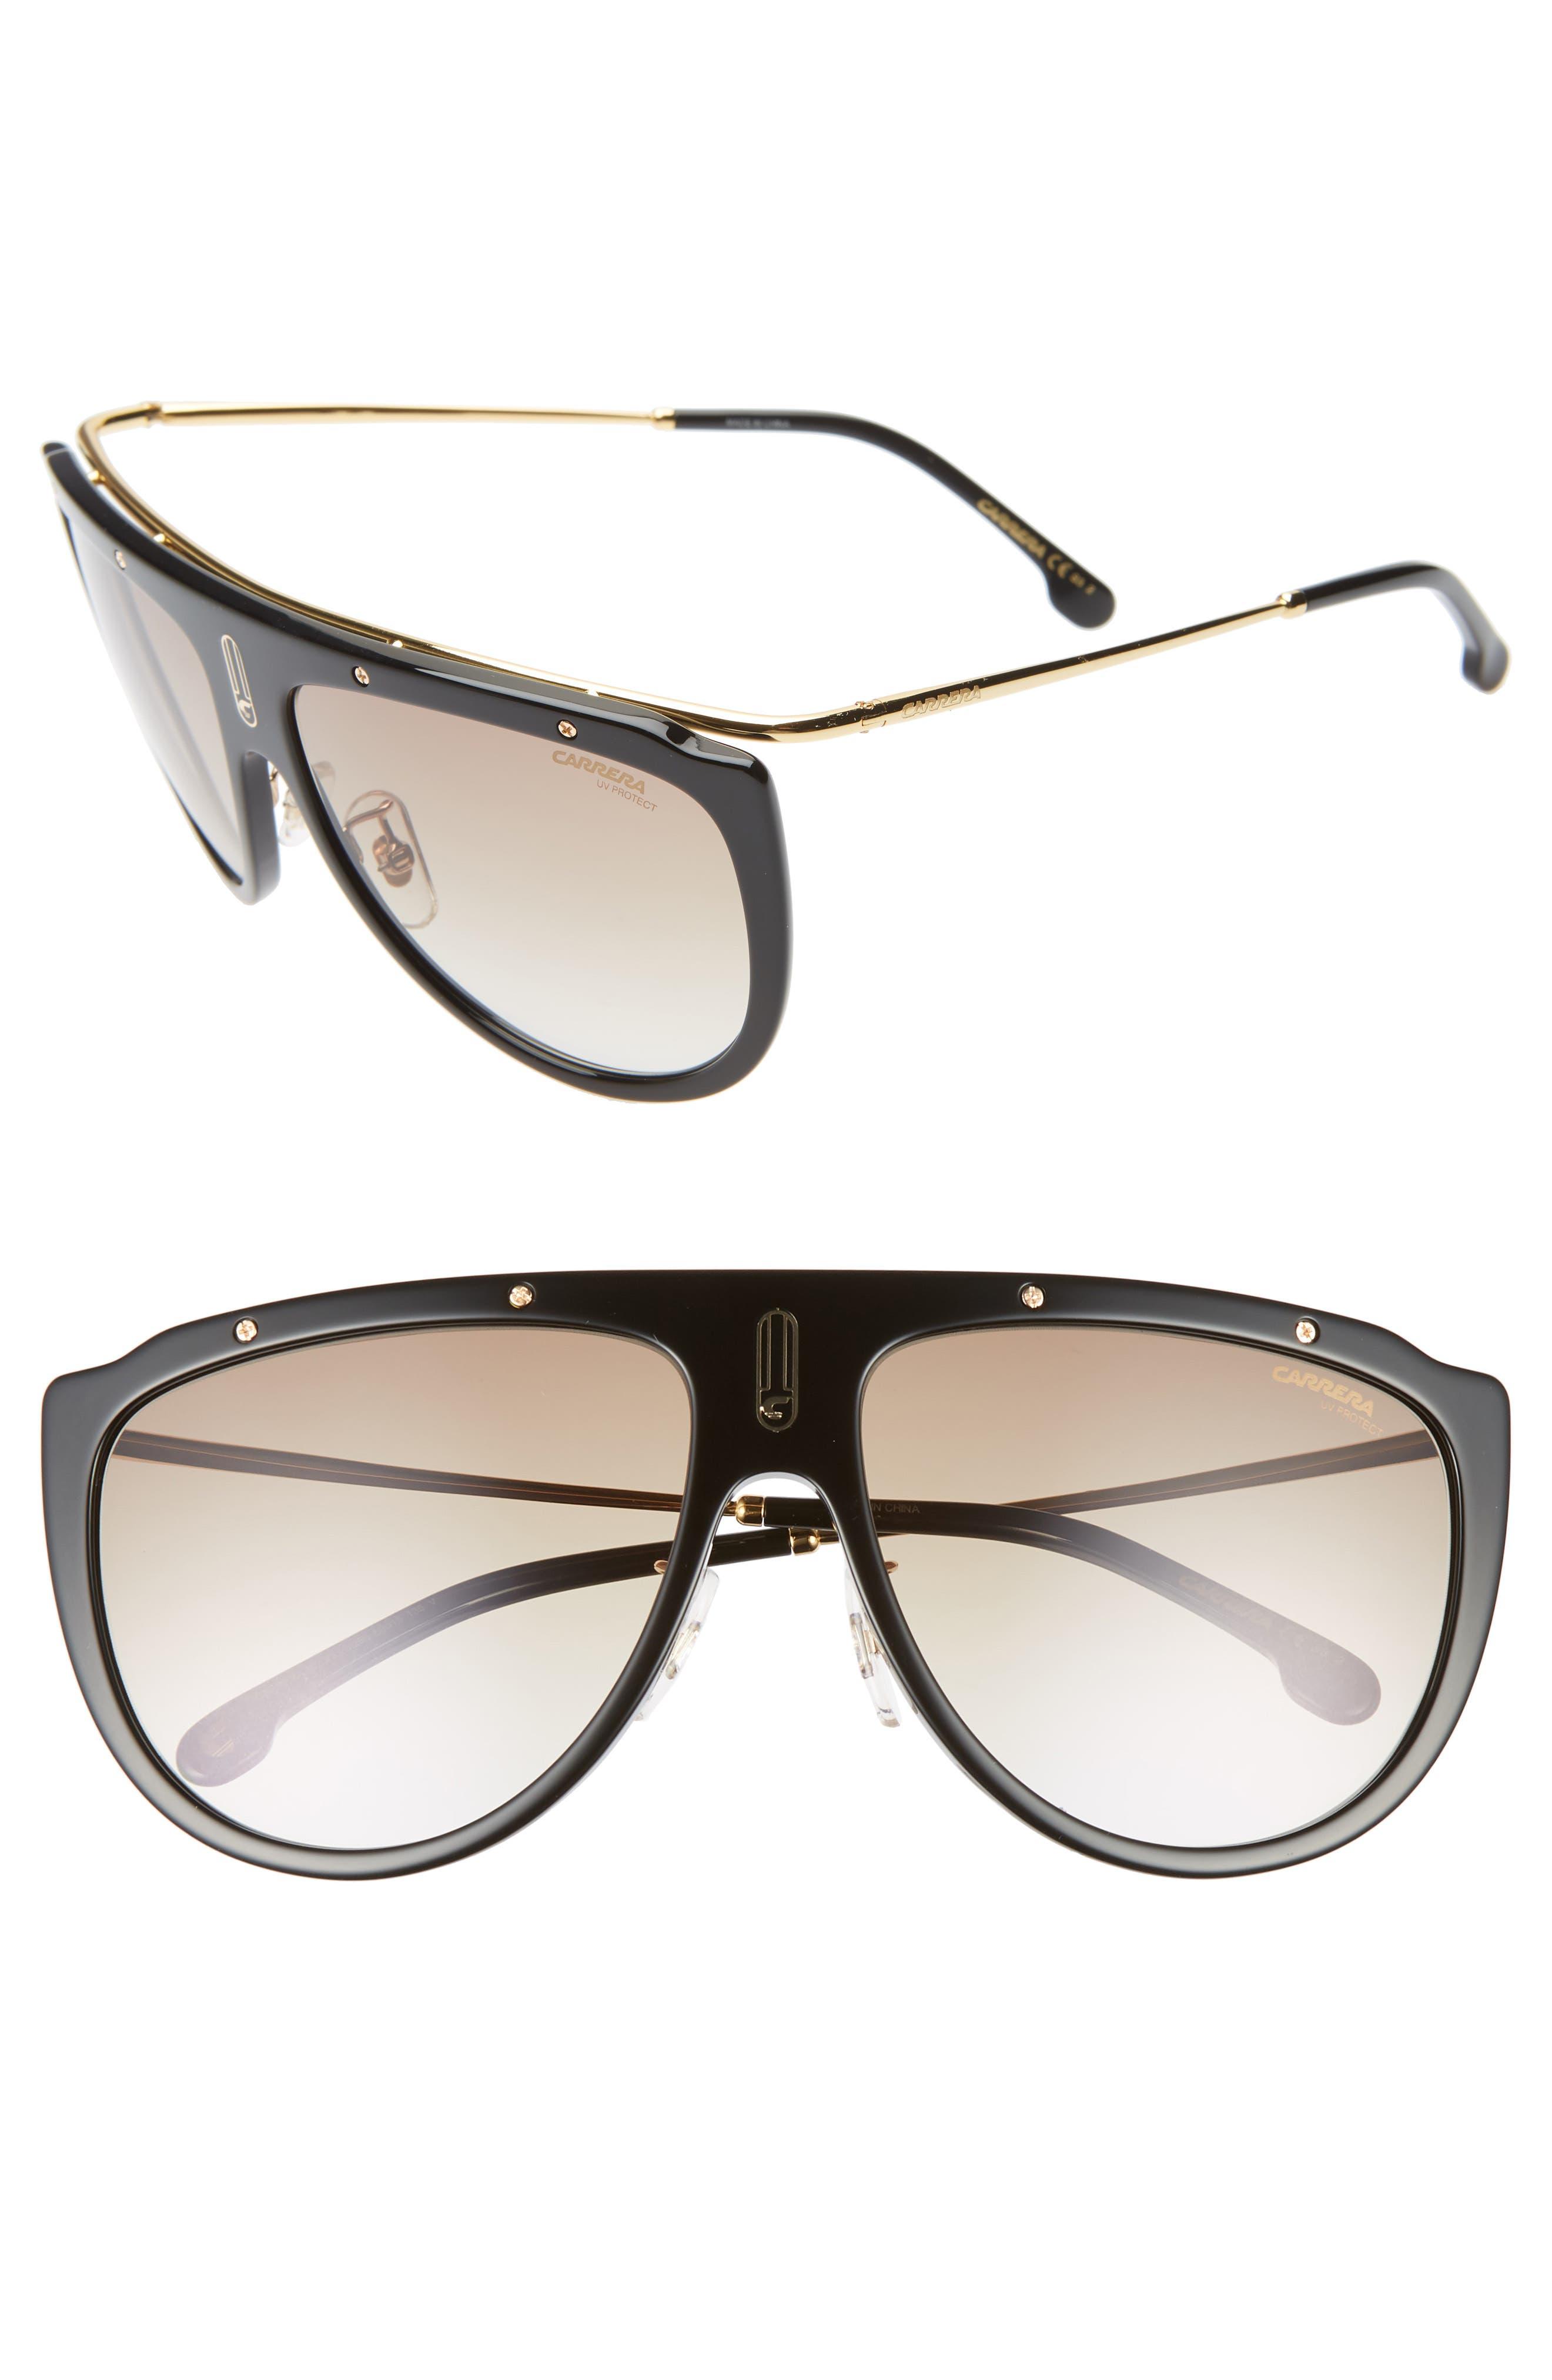 Carrera Eyewear 60Mm Aviator Sunglasses - Black